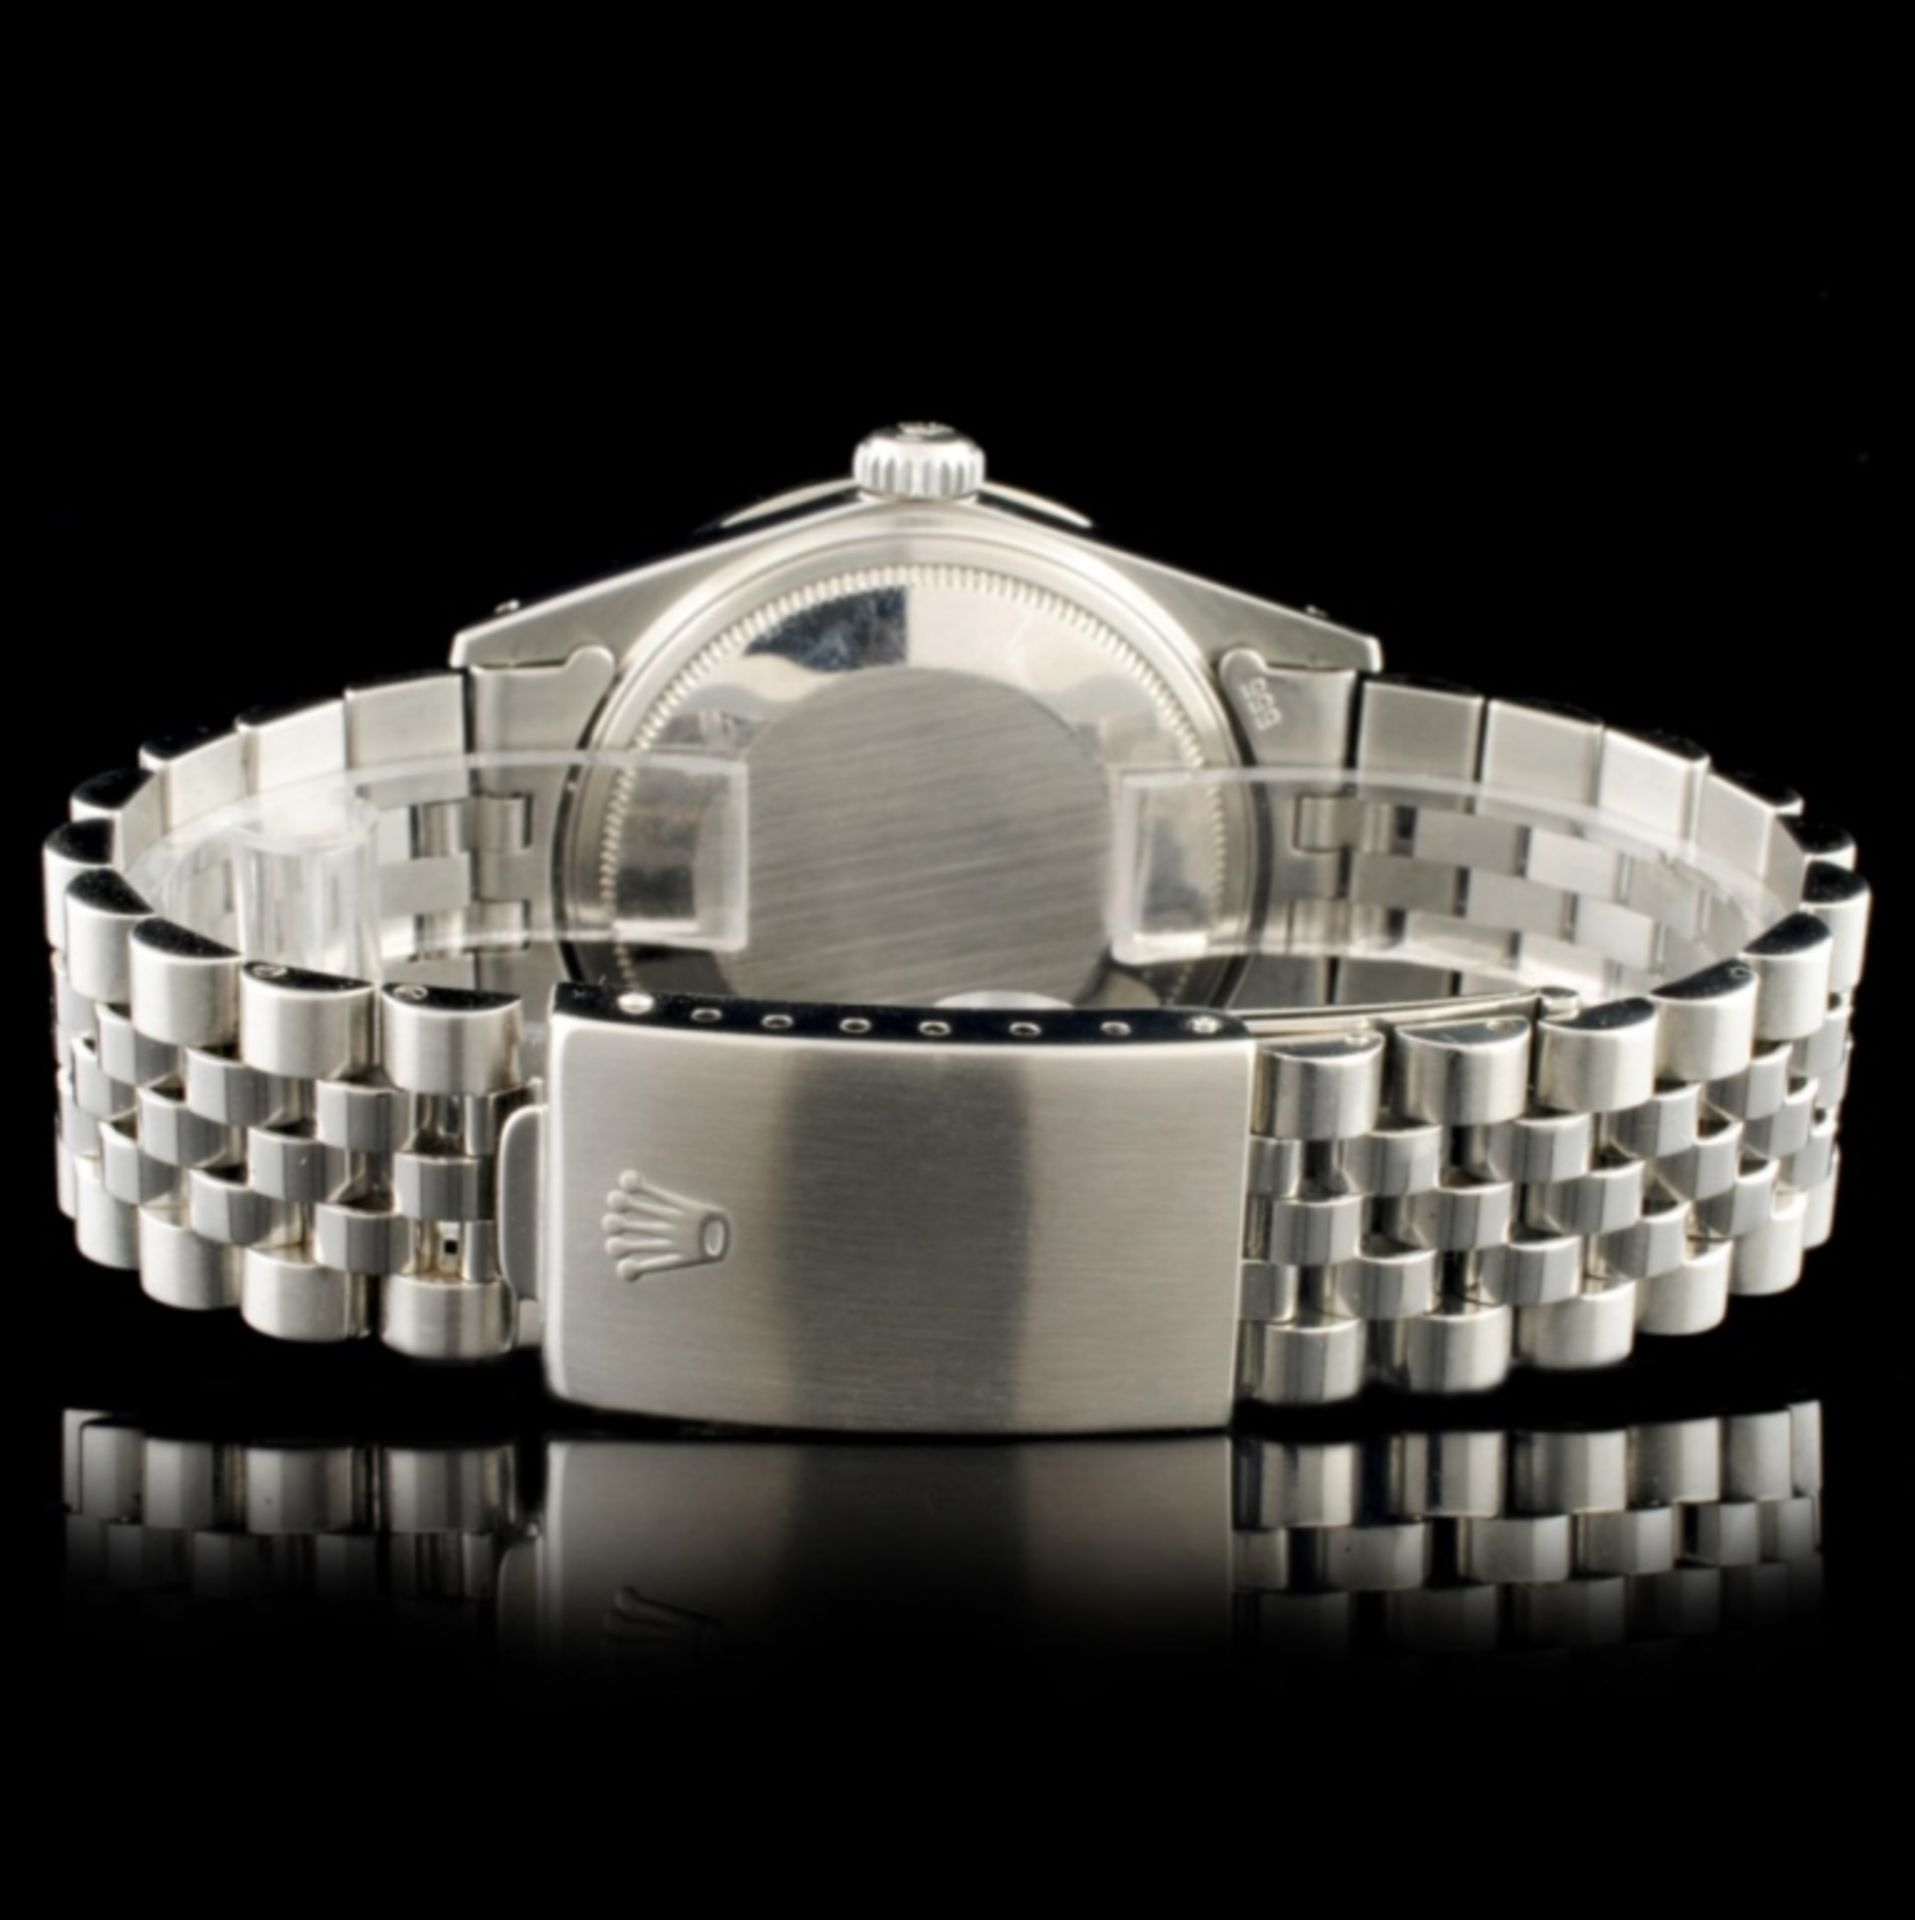 Rolex DateJust Diamond 36MM Wristwatch - Image 5 of 7